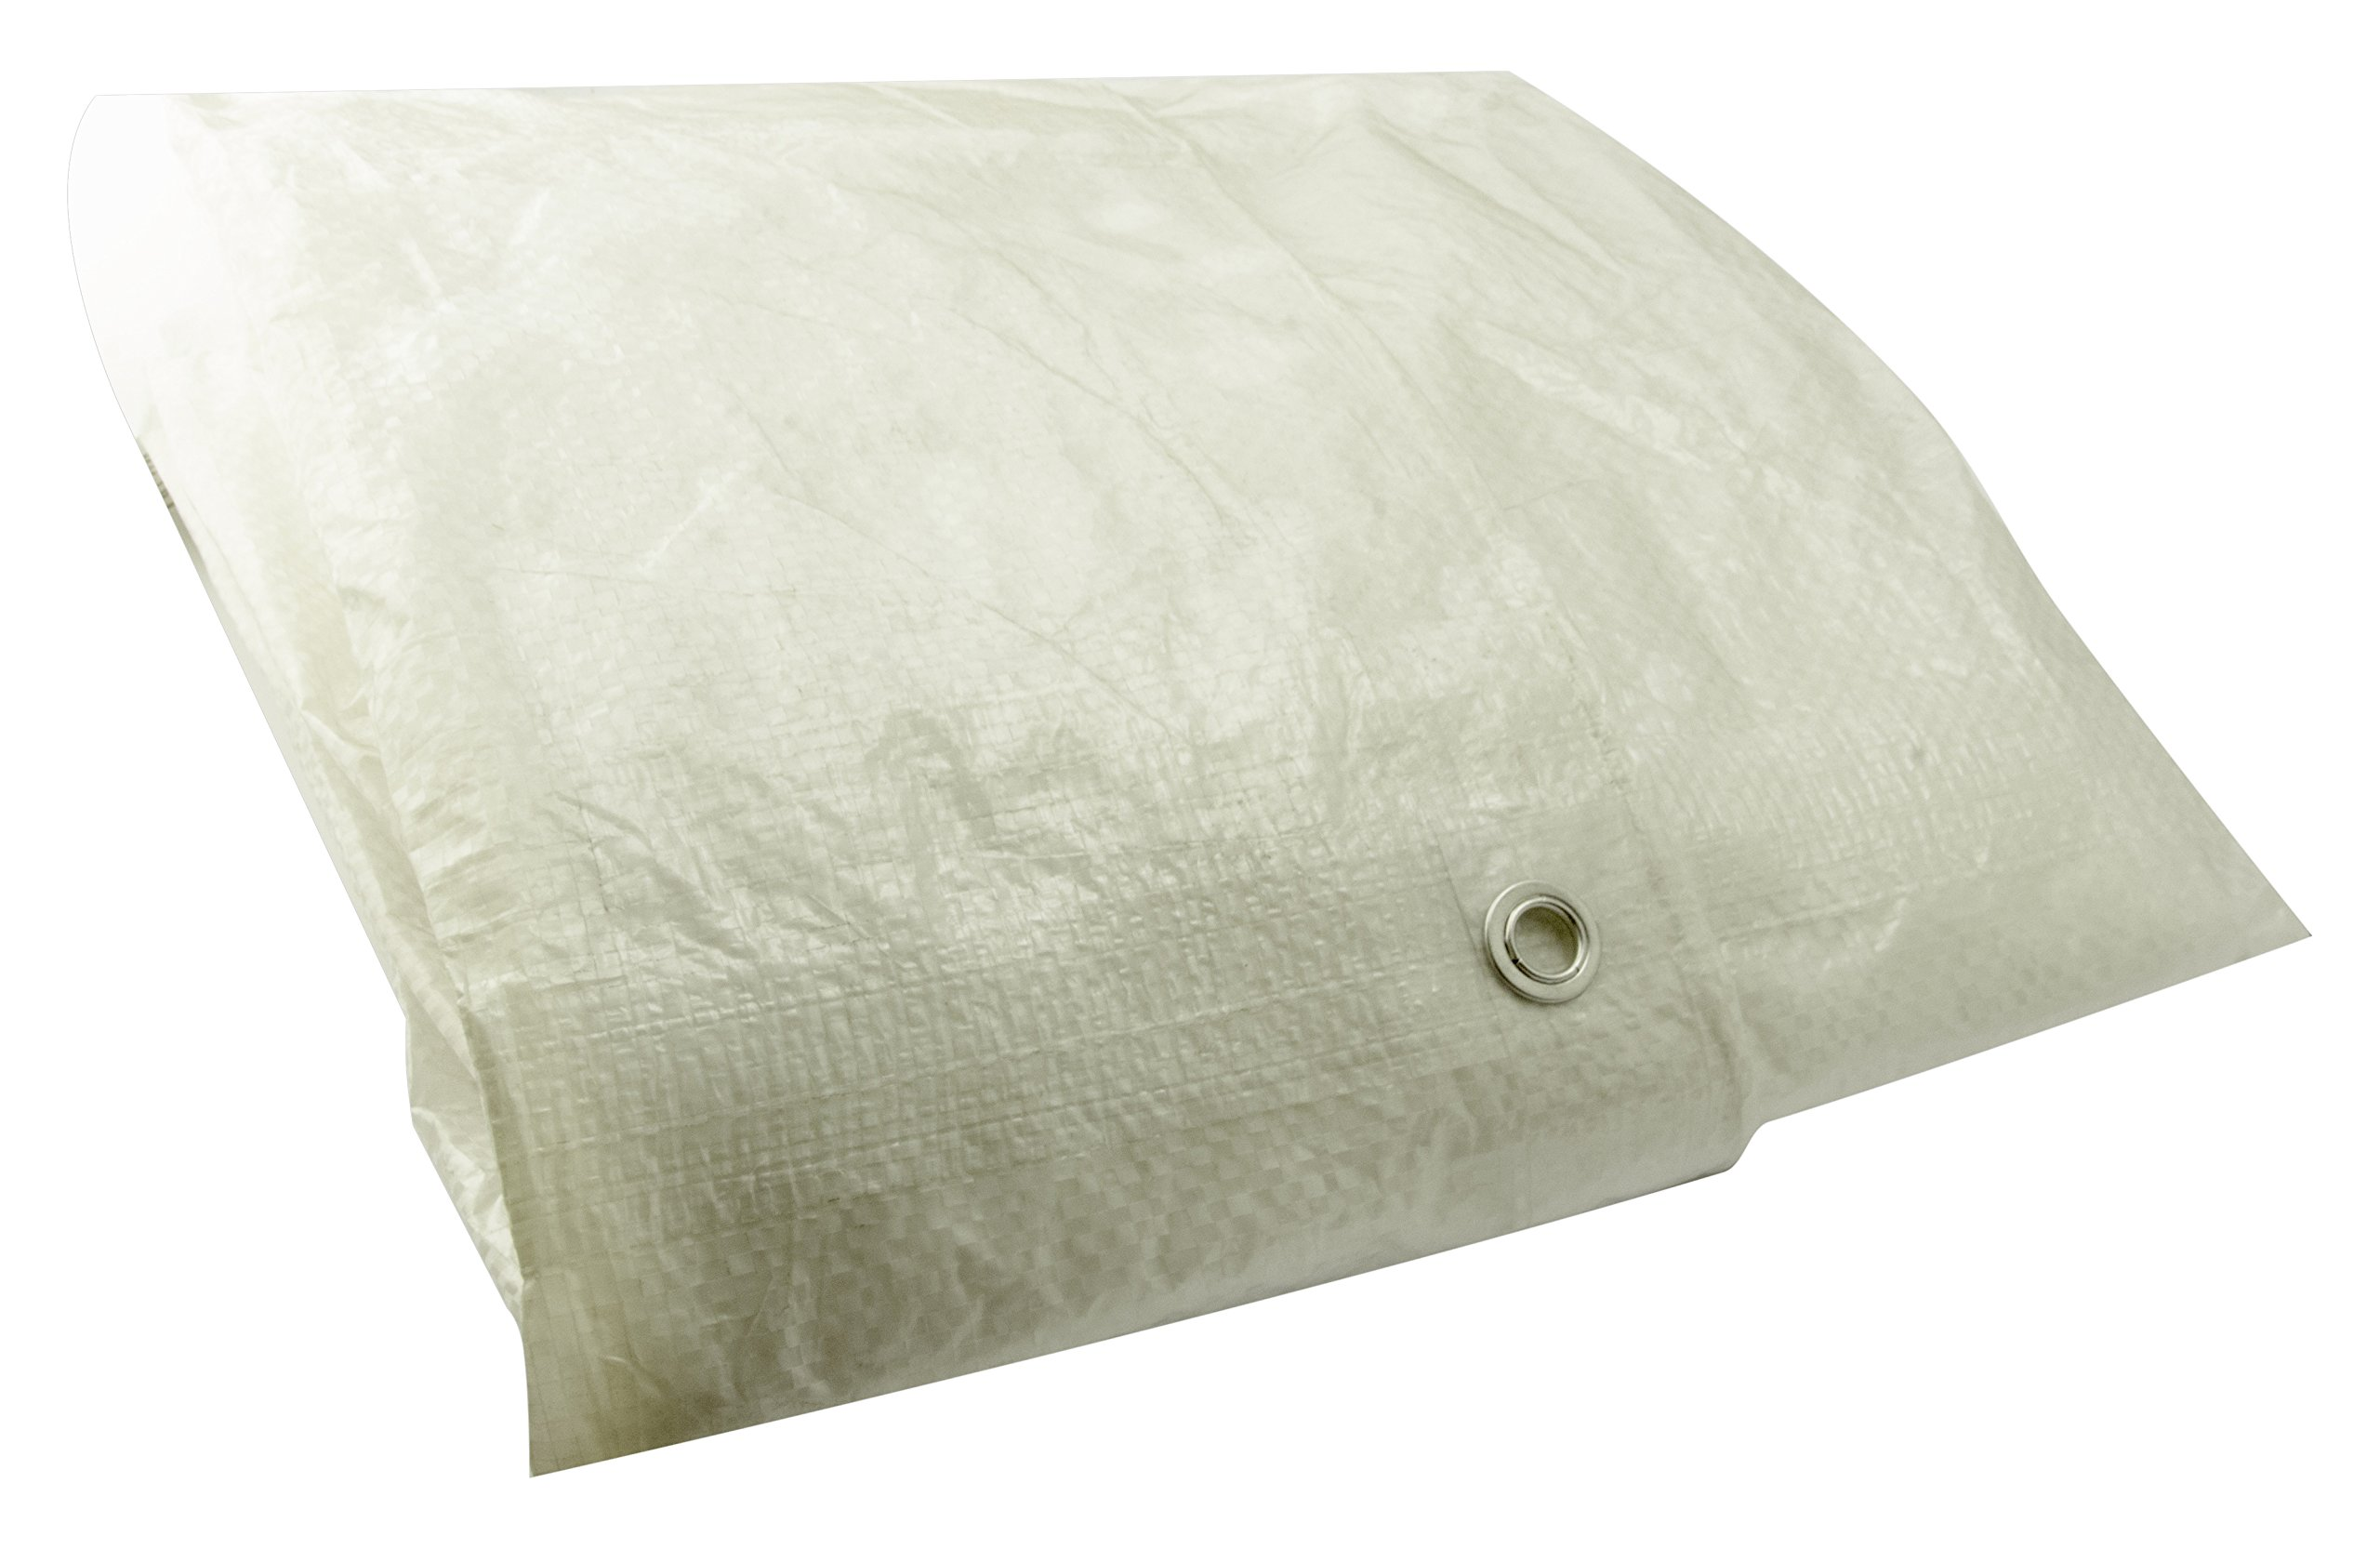 Erickson 57061 Clear White Economy Grade Poly Tarp, 8' x 10', 1 Pack